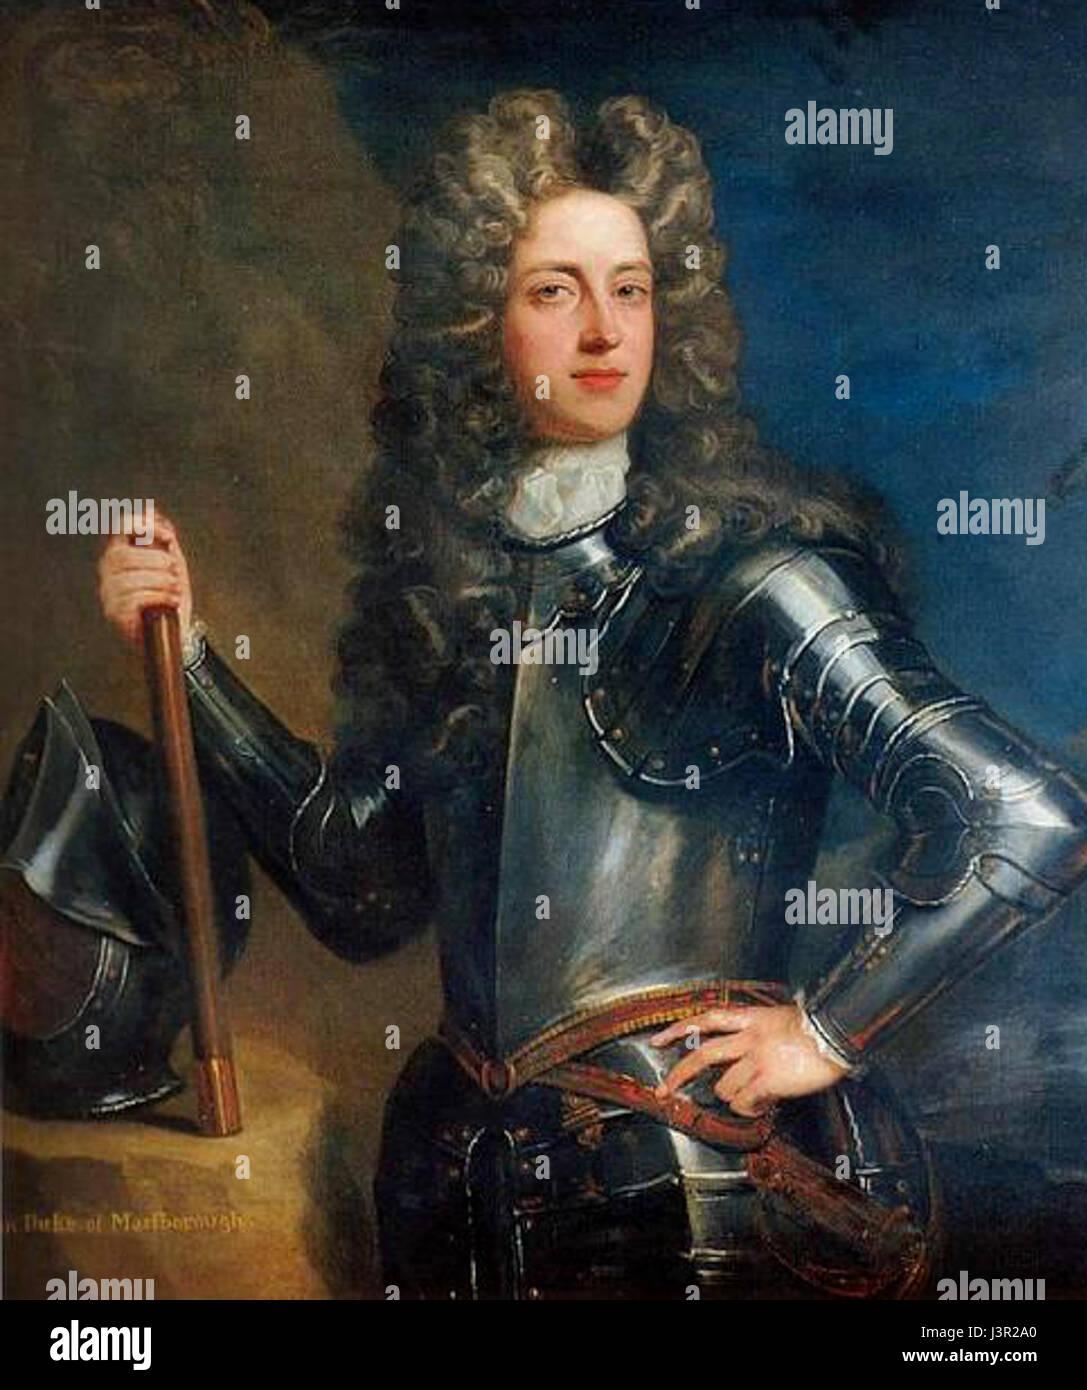 John churchill first duke of marlborough - Stock Image